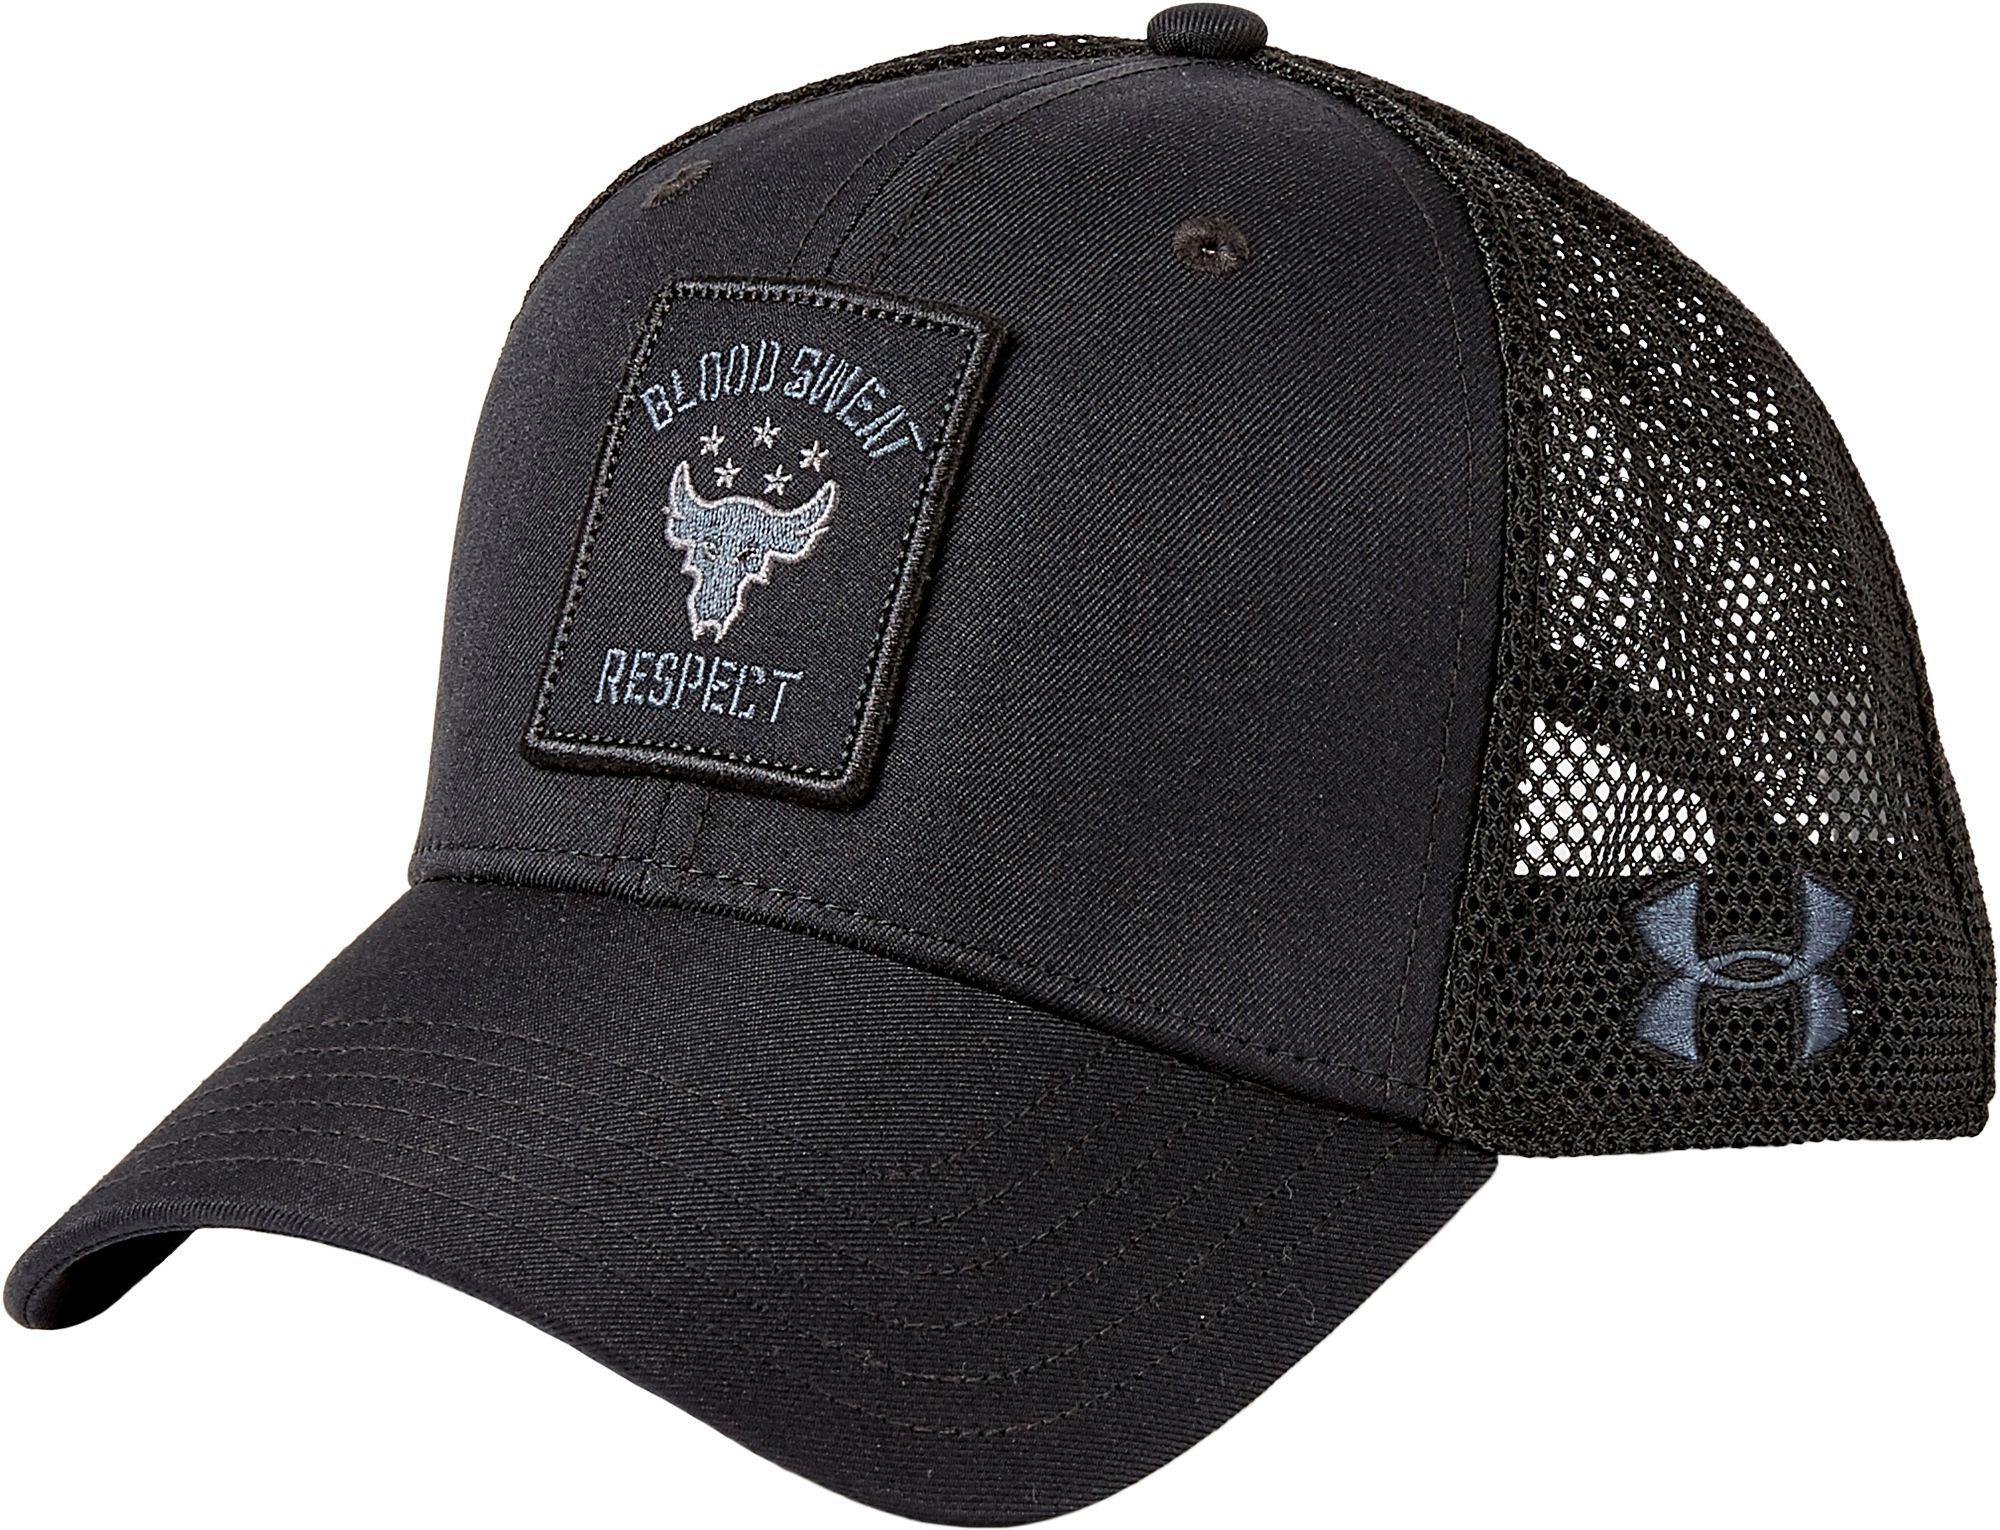 ec0b977c5292f ... canada lyst under armour project rock trucker hat in black for men  f1856 6e874